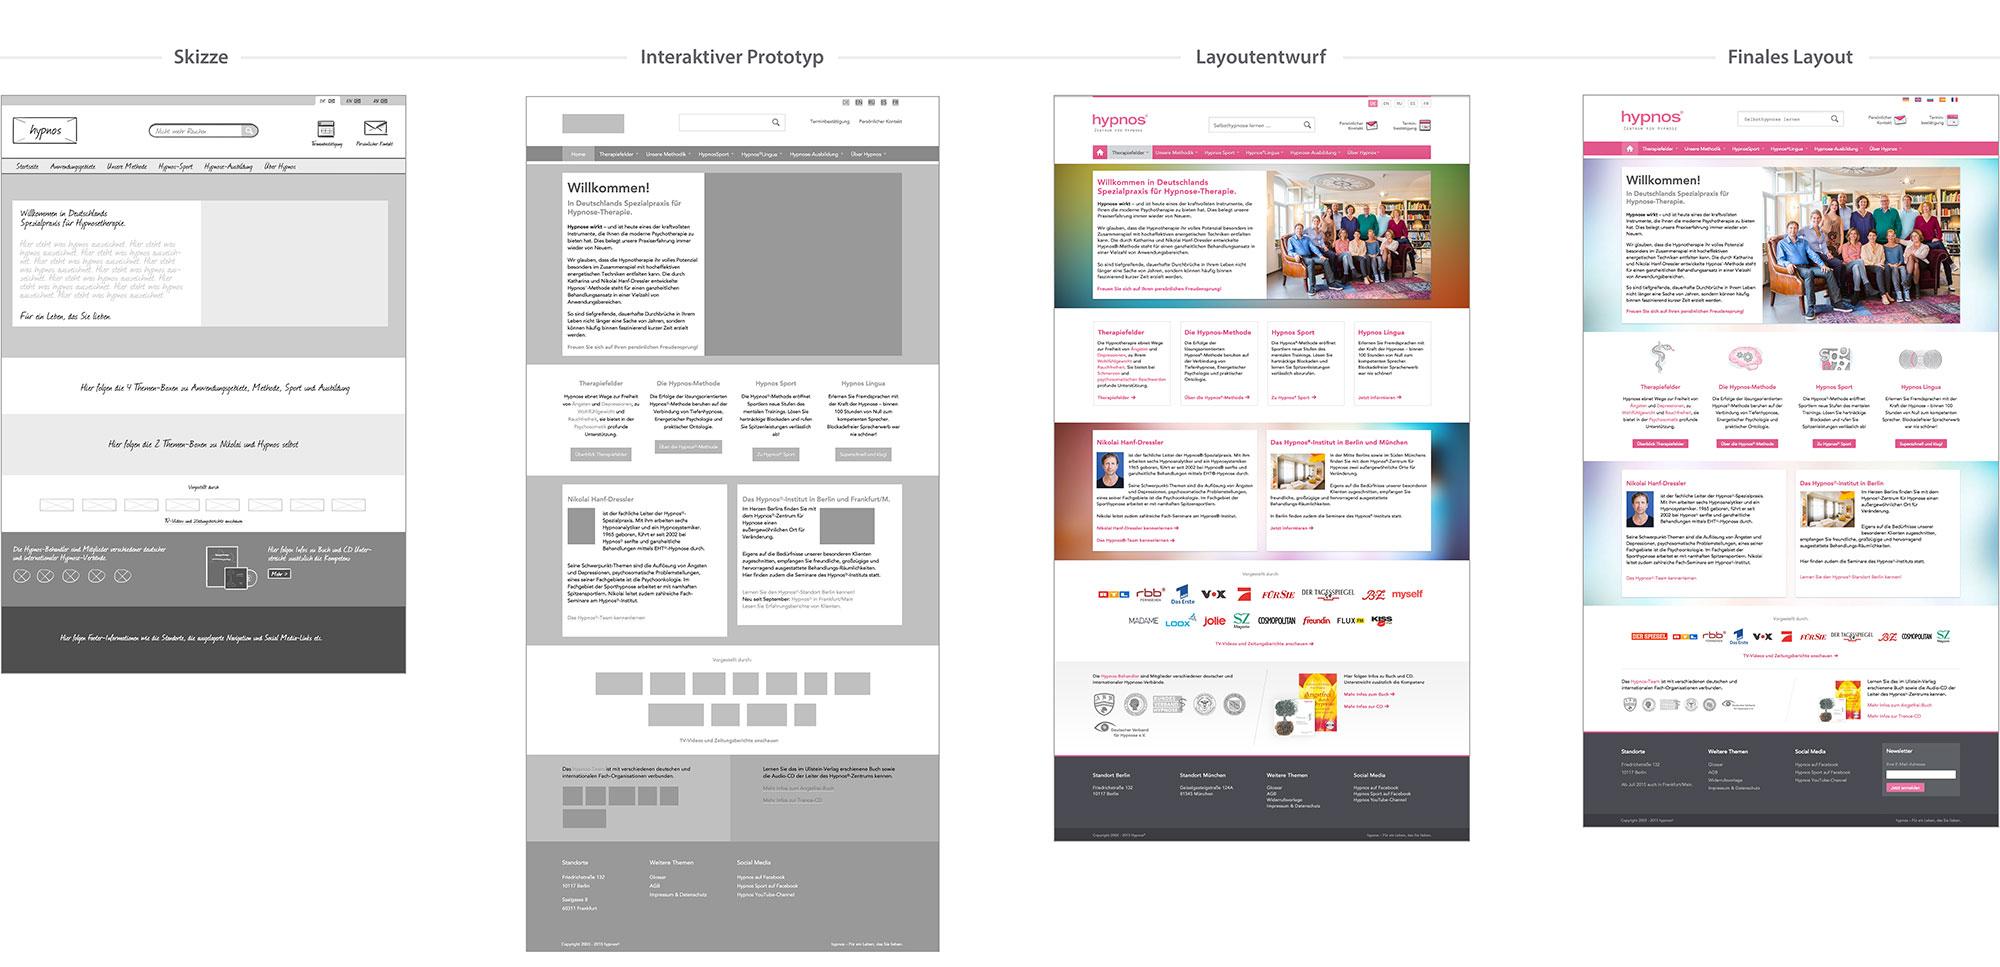 hypnos-skizze-prototyp-design-website